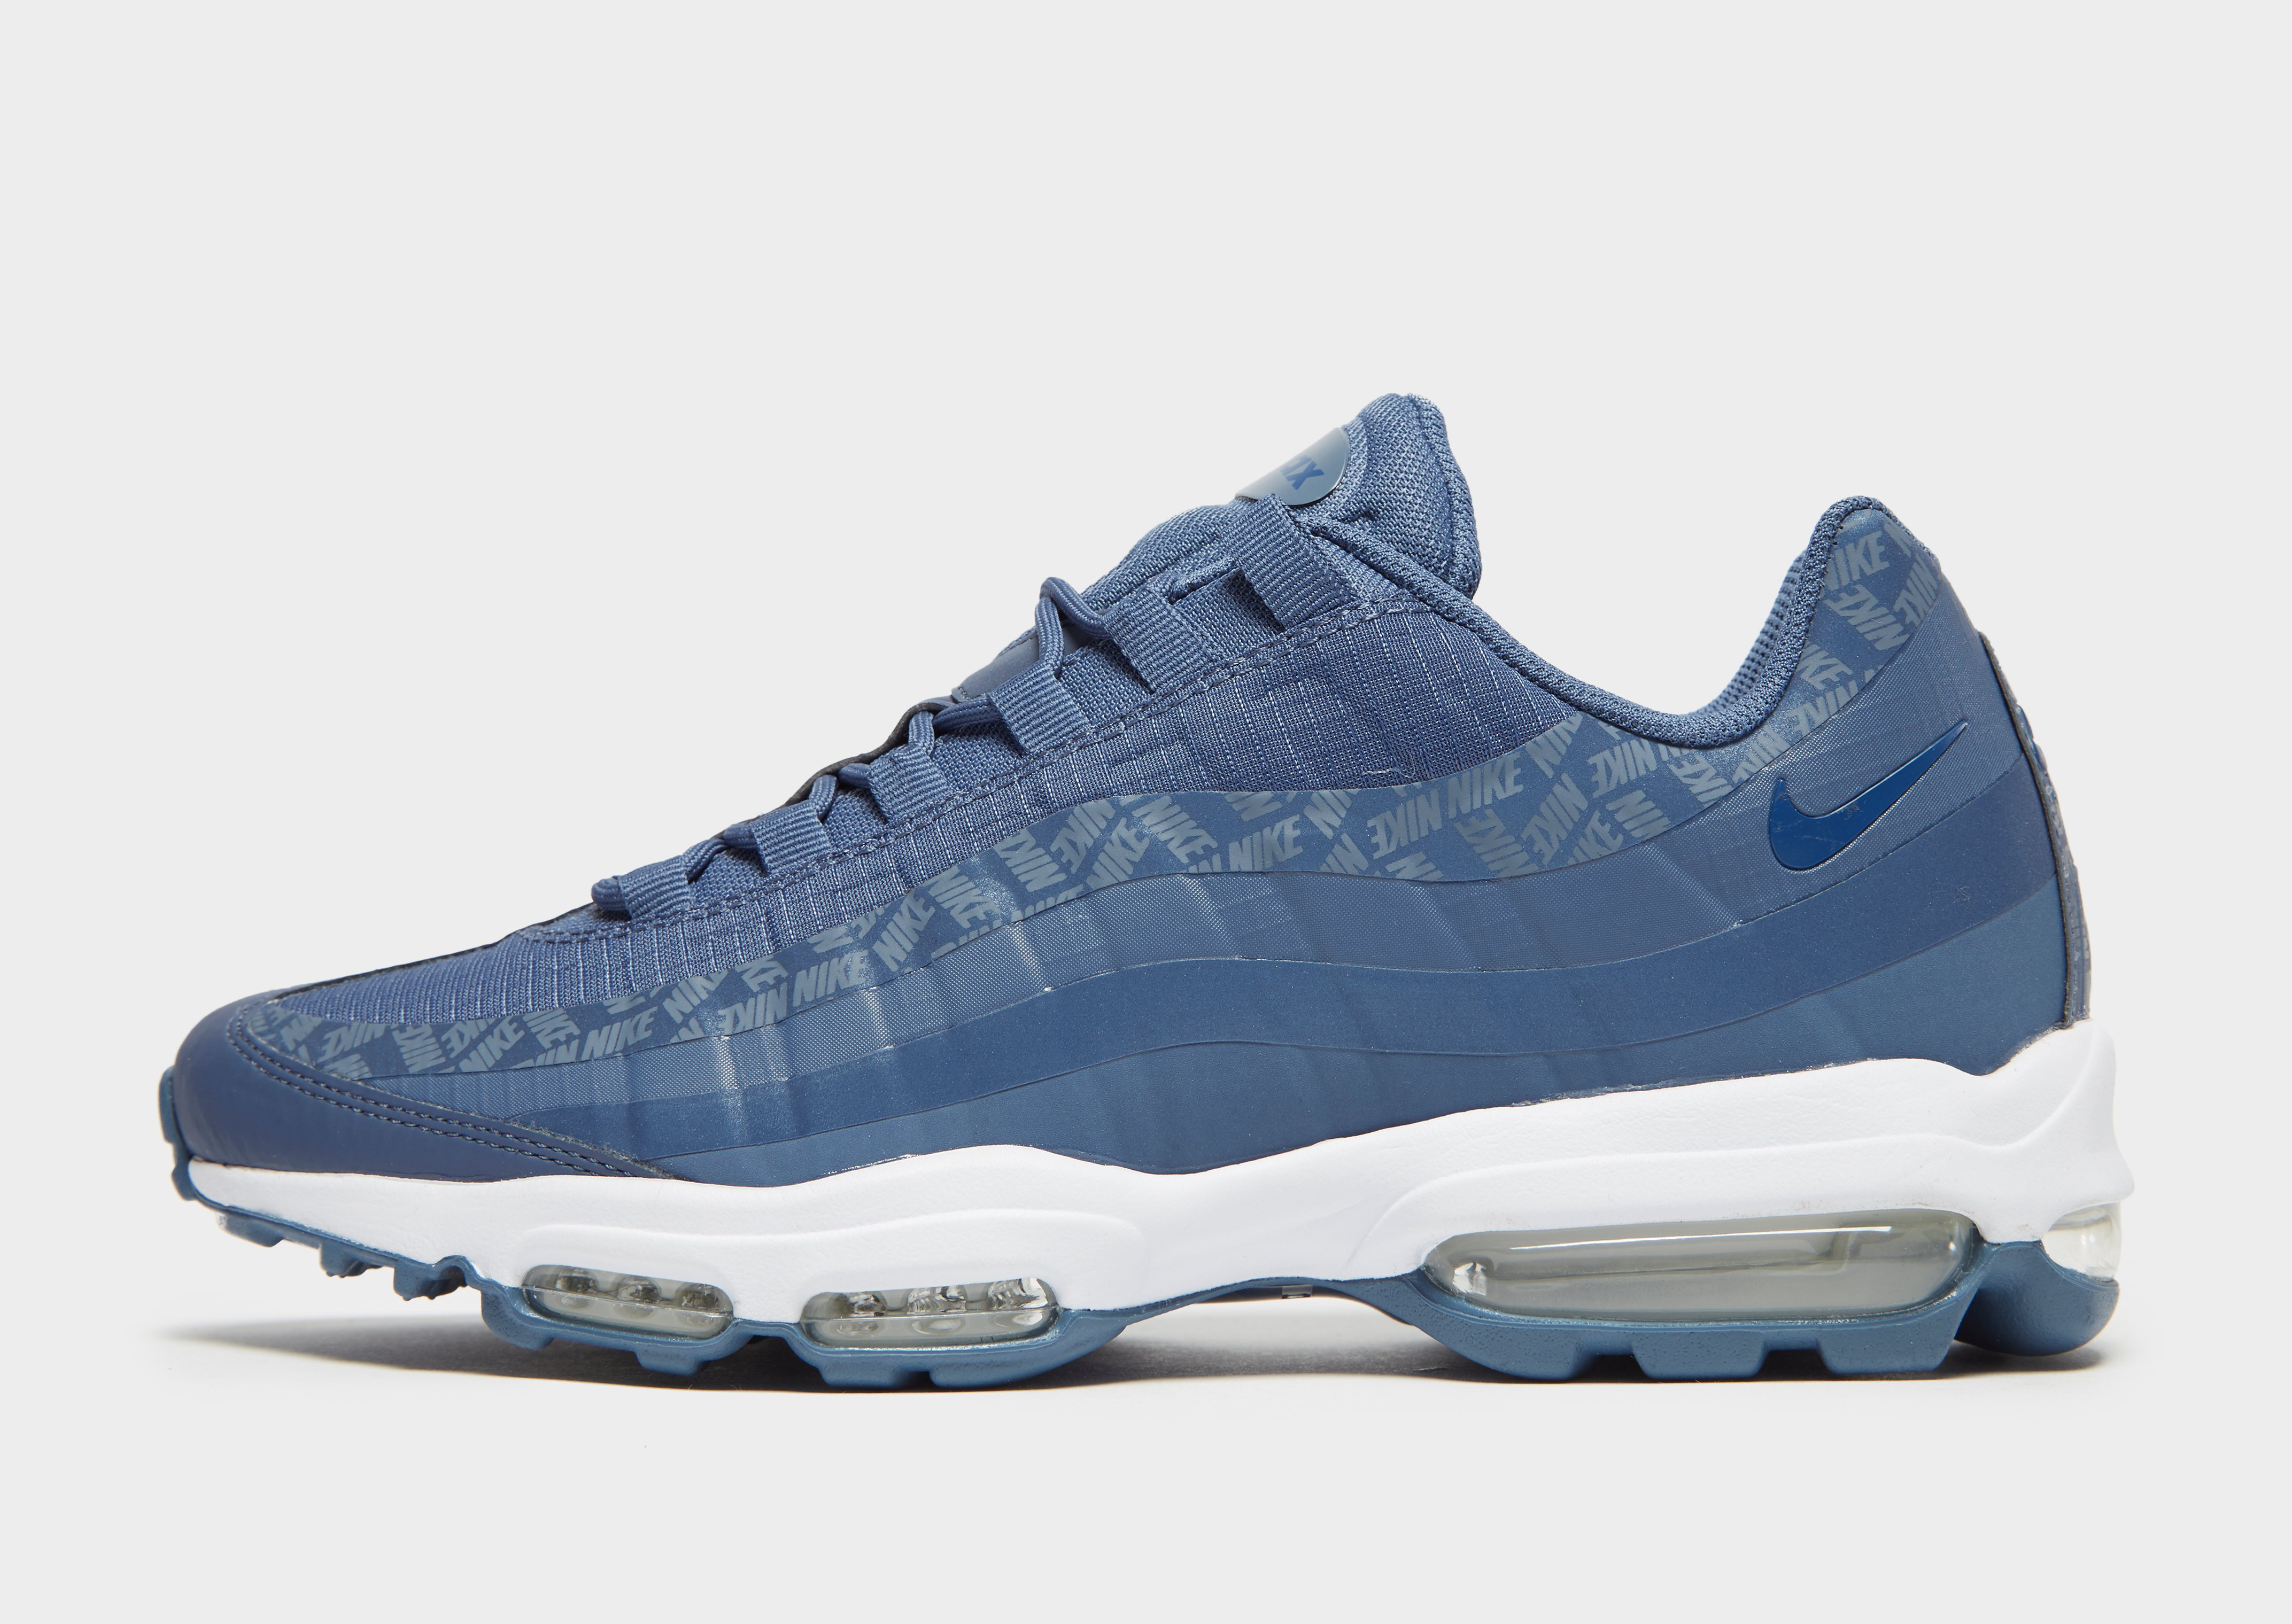 best website f13bb aa01e Nike Air Max 95 Ultra SE   JD Sports nike air max 95 ultra blue